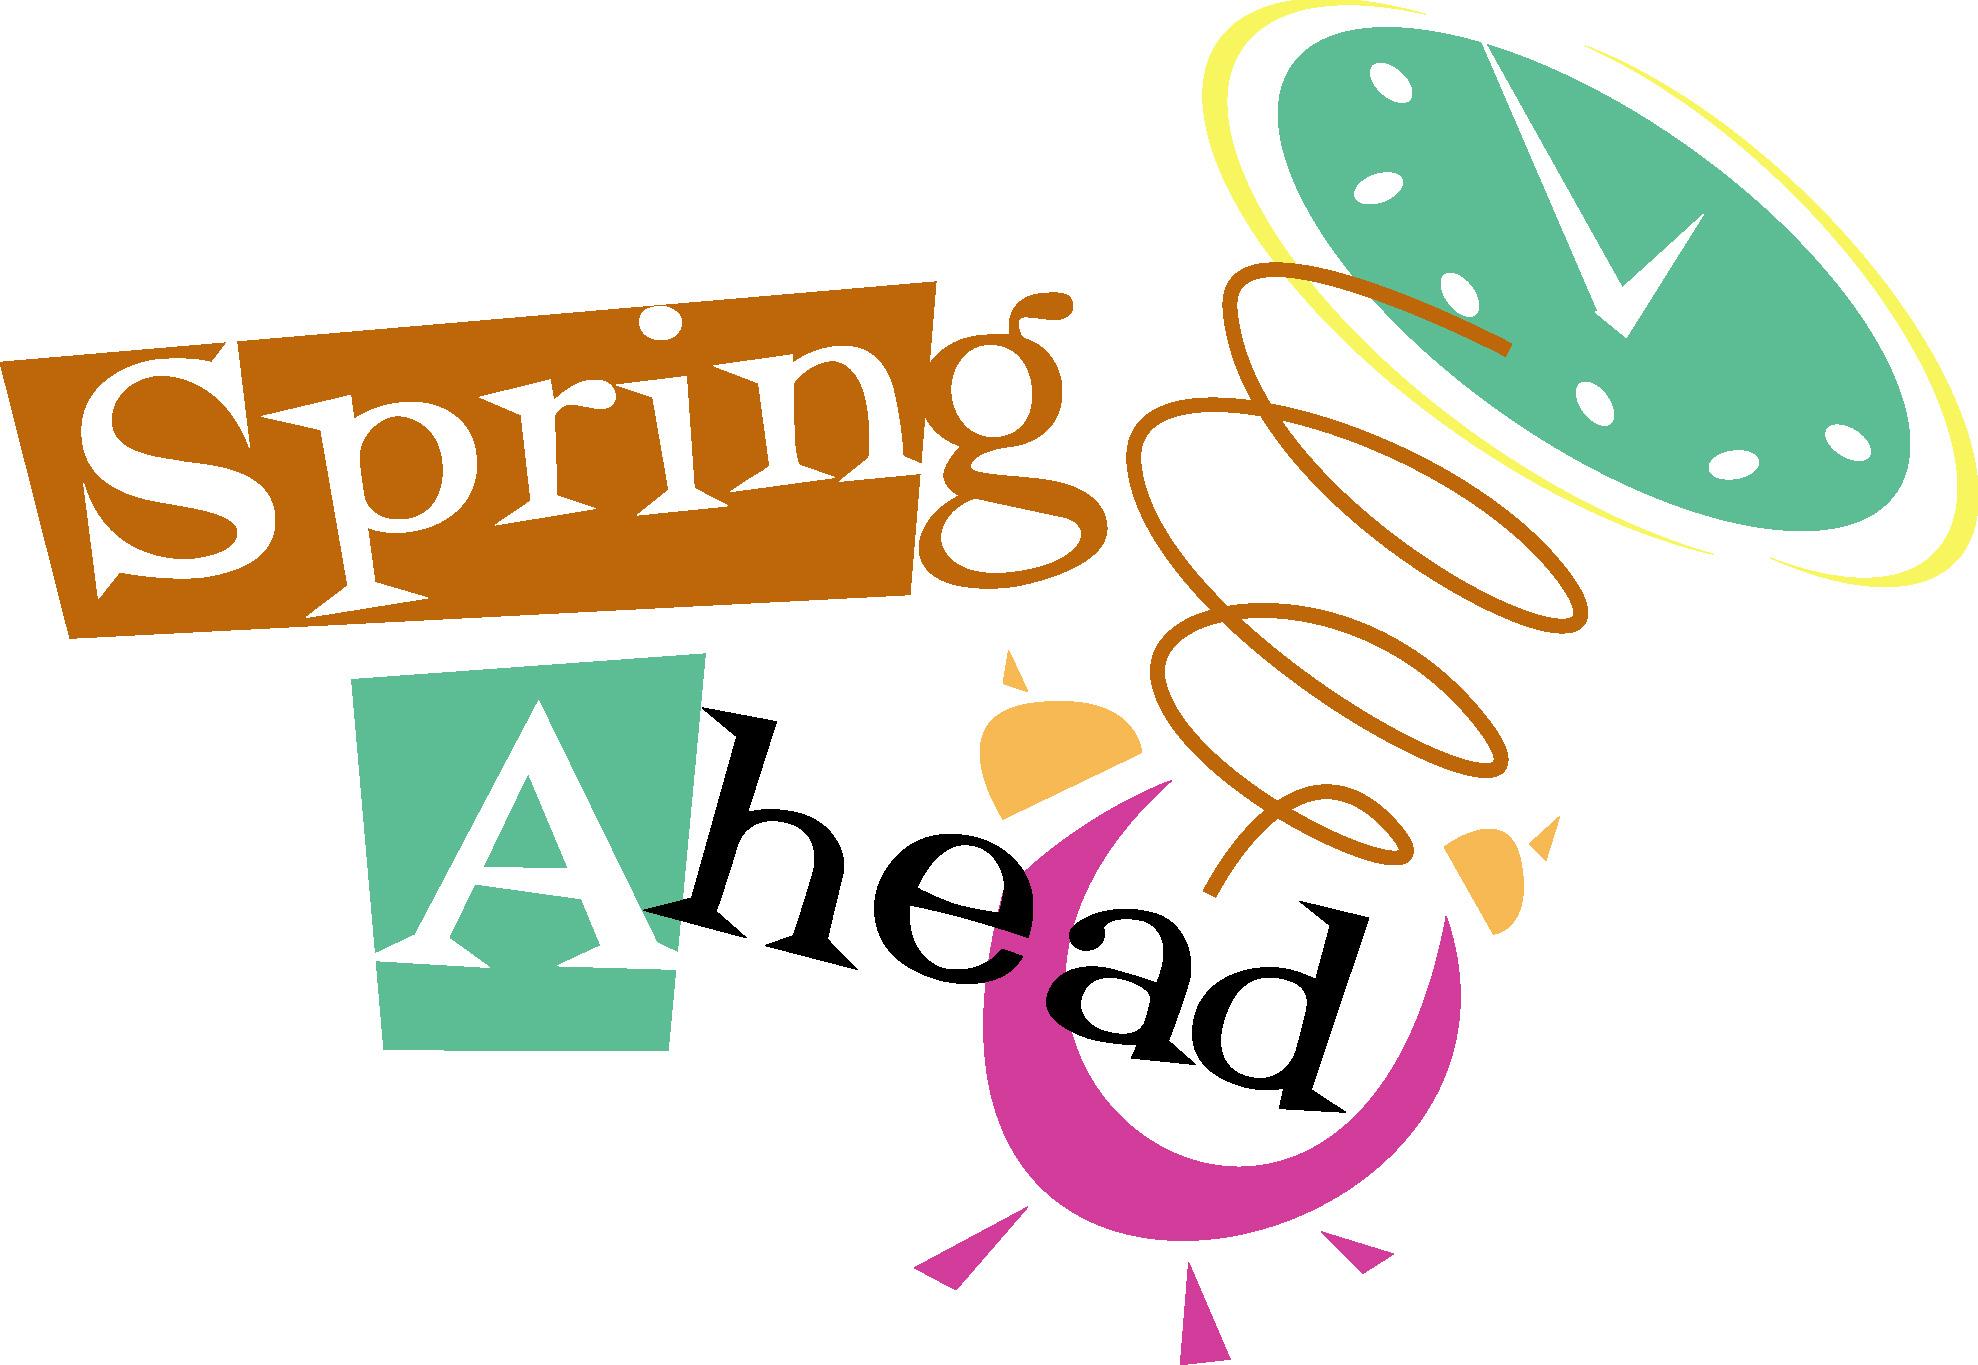 1978x1365 Marvellous Design Daylight Savings Time Clipart Seasonal Spring